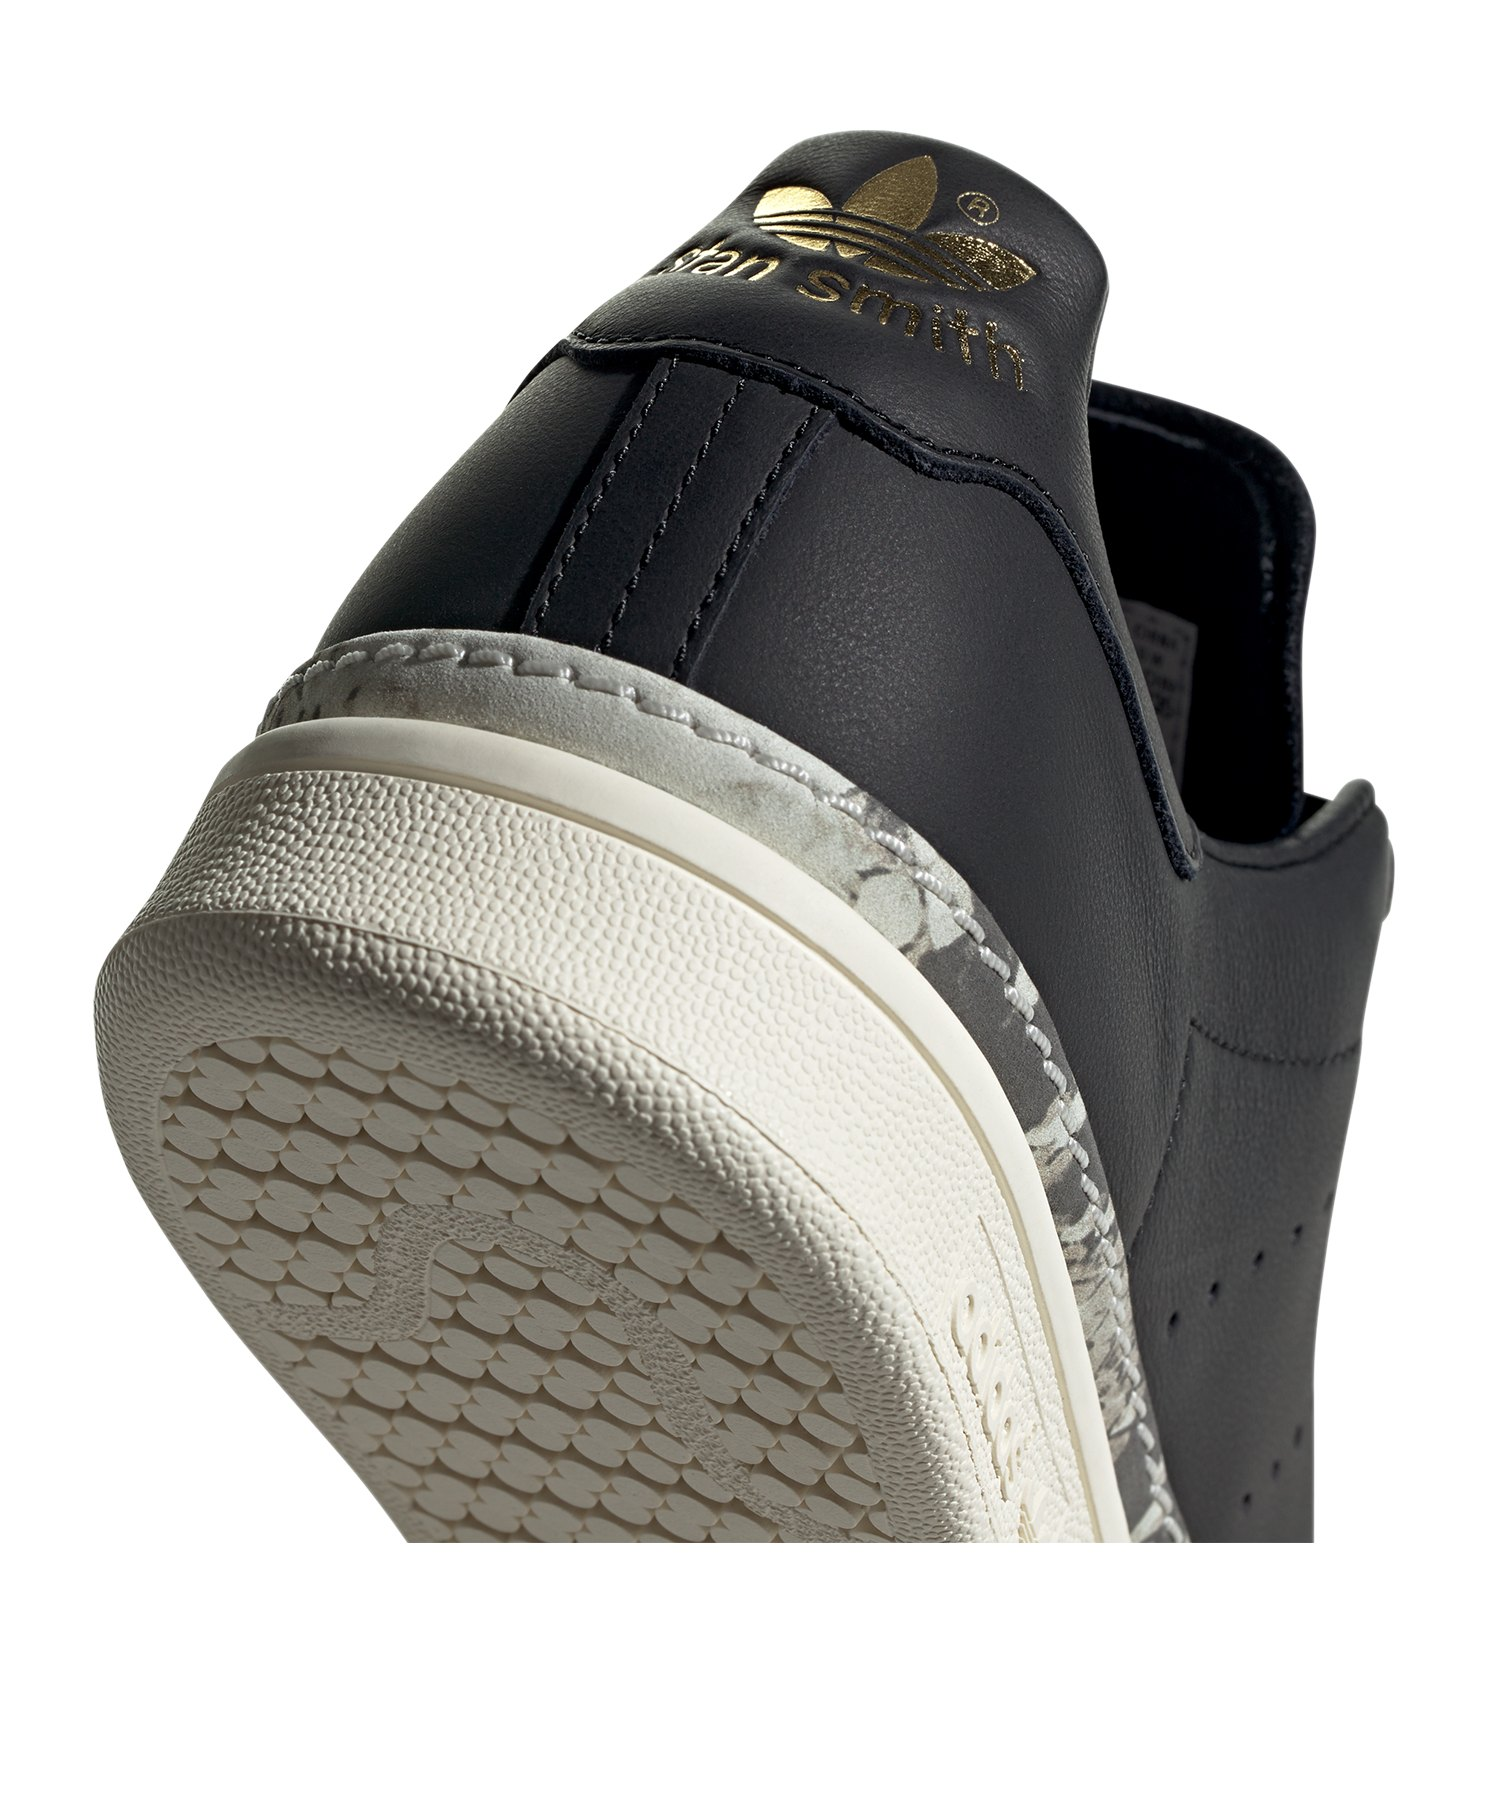 release date fe40b 5ad40 ... adidas Originals Stan Smith New Bold Sneaker Damen Schwarz - schwarz ...